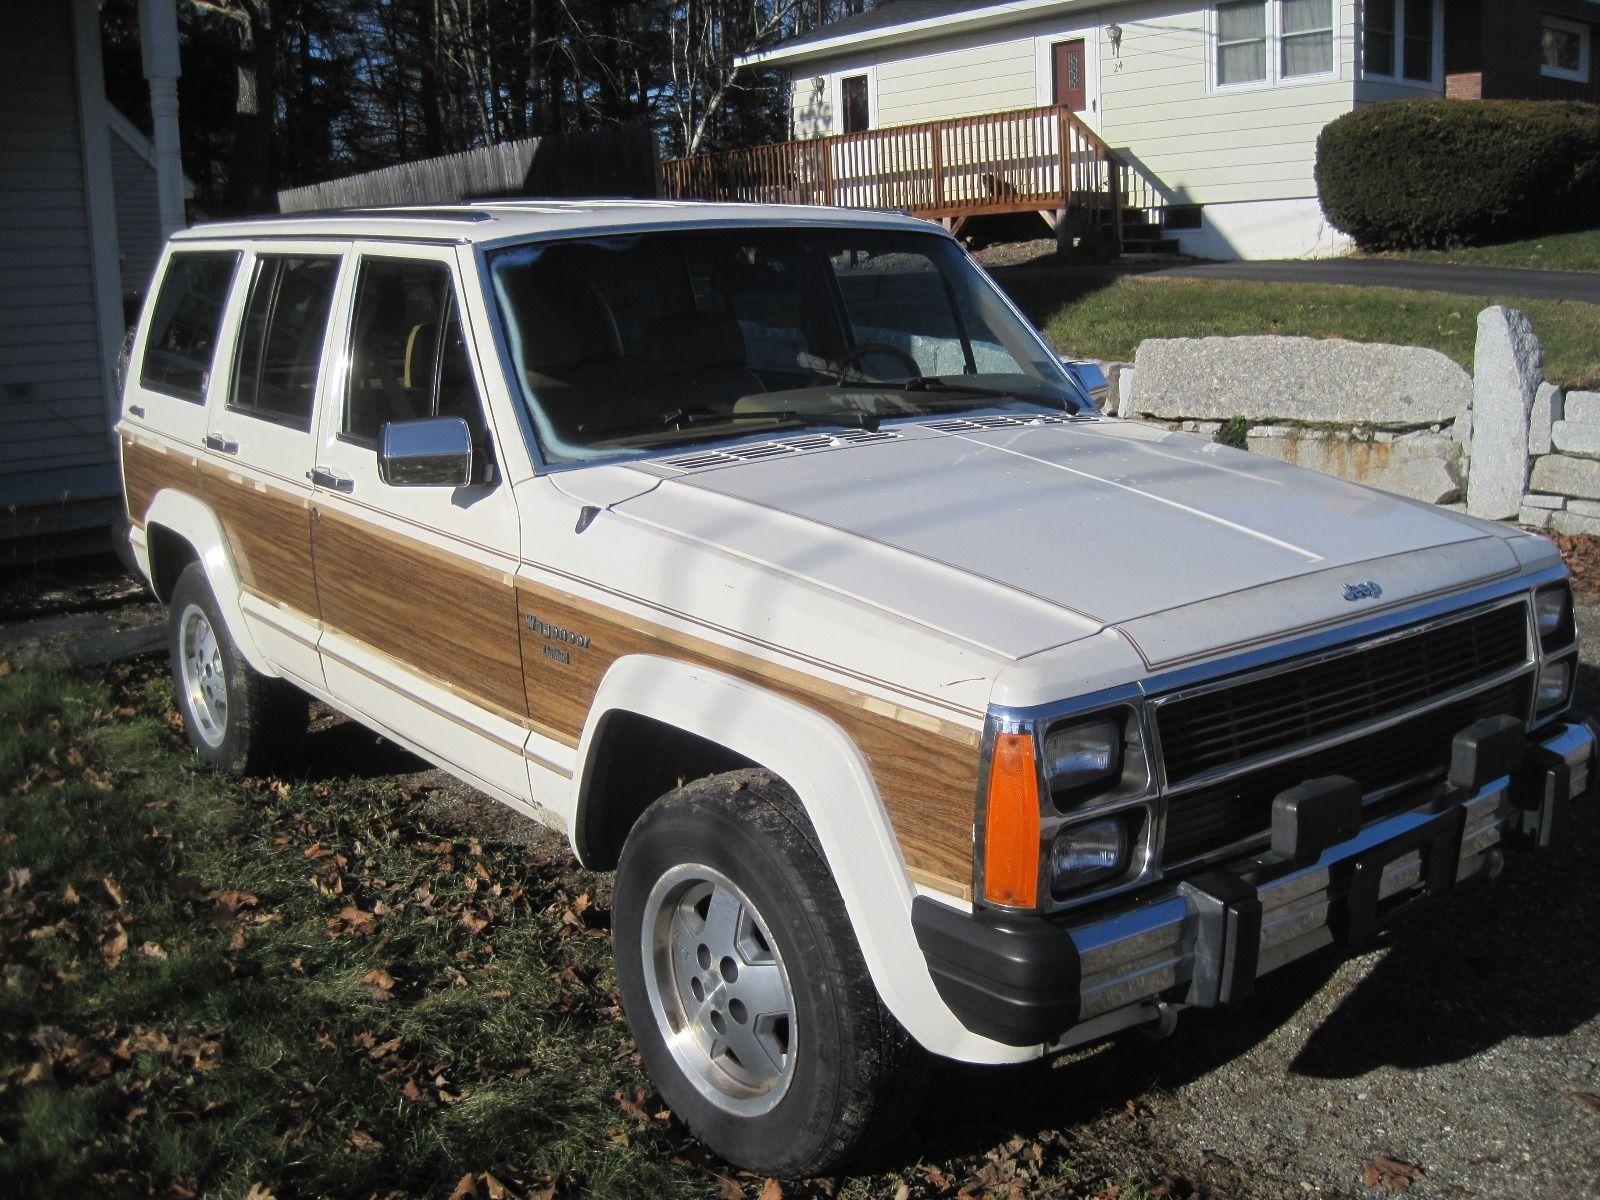 Jeep Cherokee Xj Jeep Cherokee Xj Jeep Jeep Cherokee